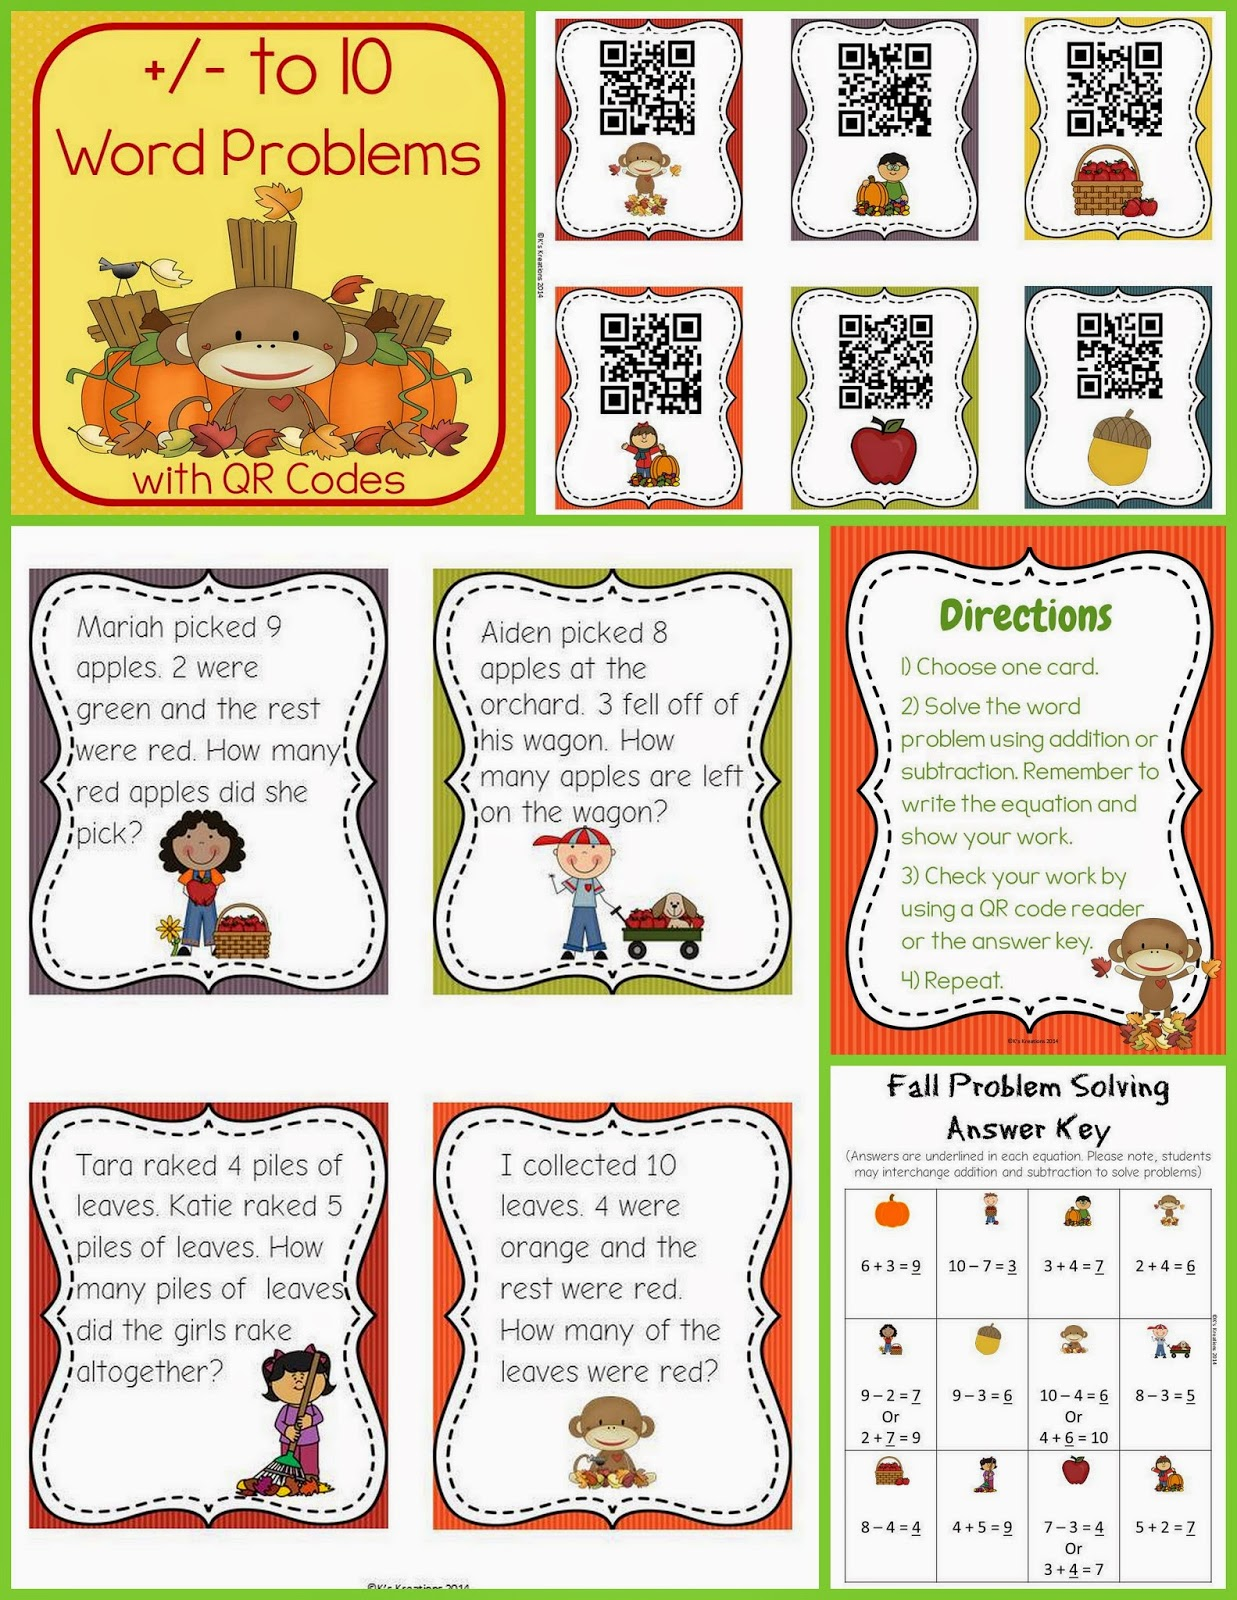 http://www.teacherspayteachers.com/Product/Fall-Word-Problems-with-QR-Codes-1st-Grade--1447054